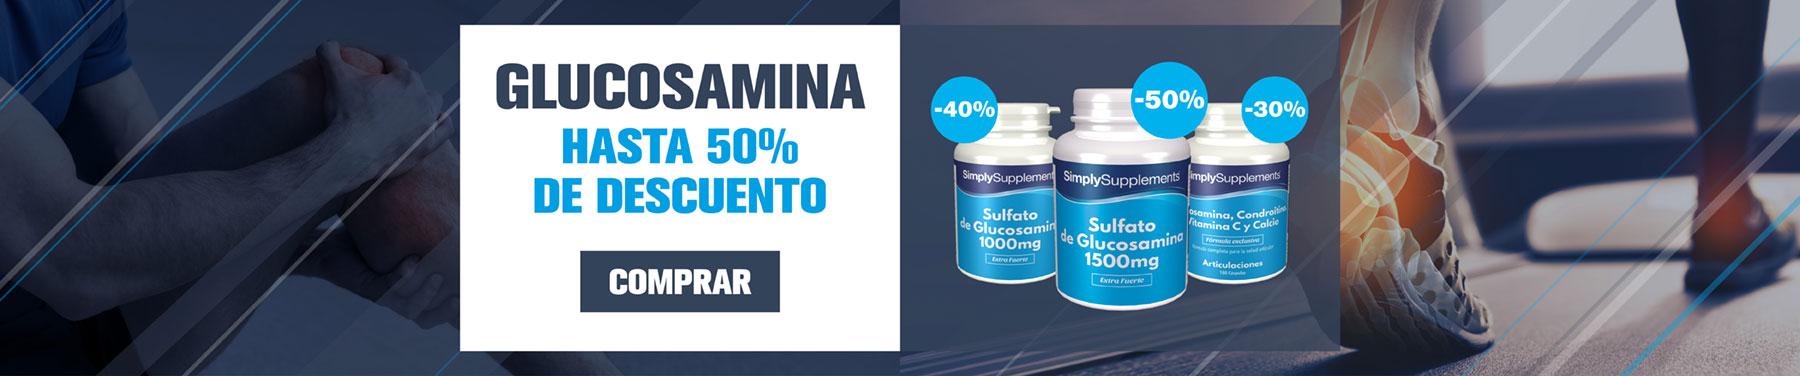 Glucosamina - Hasta 50% de descuento